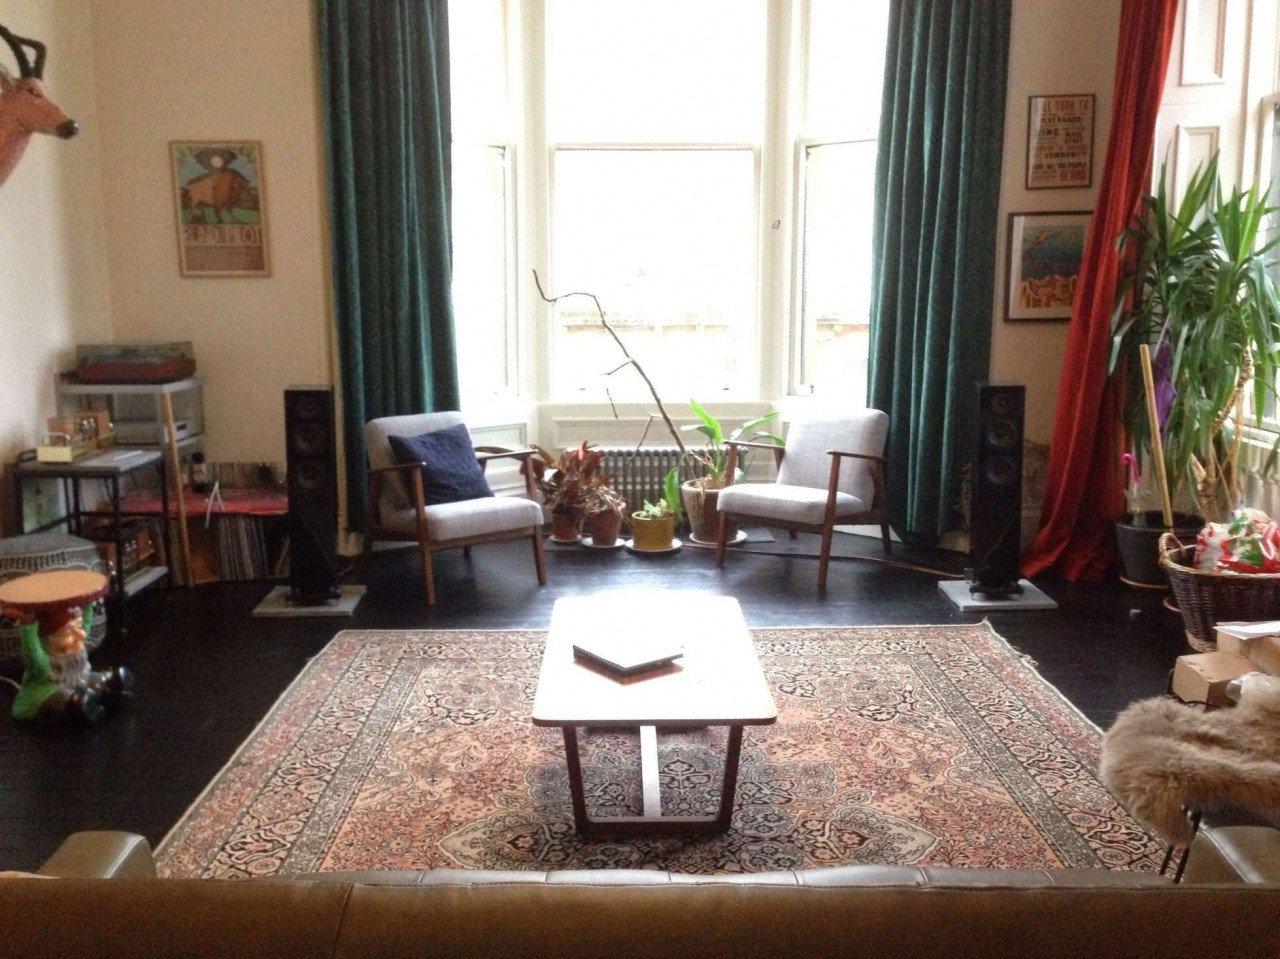 Bedroom Sitting area Ideas New Bedroom Interior Design — Procura Home Blog